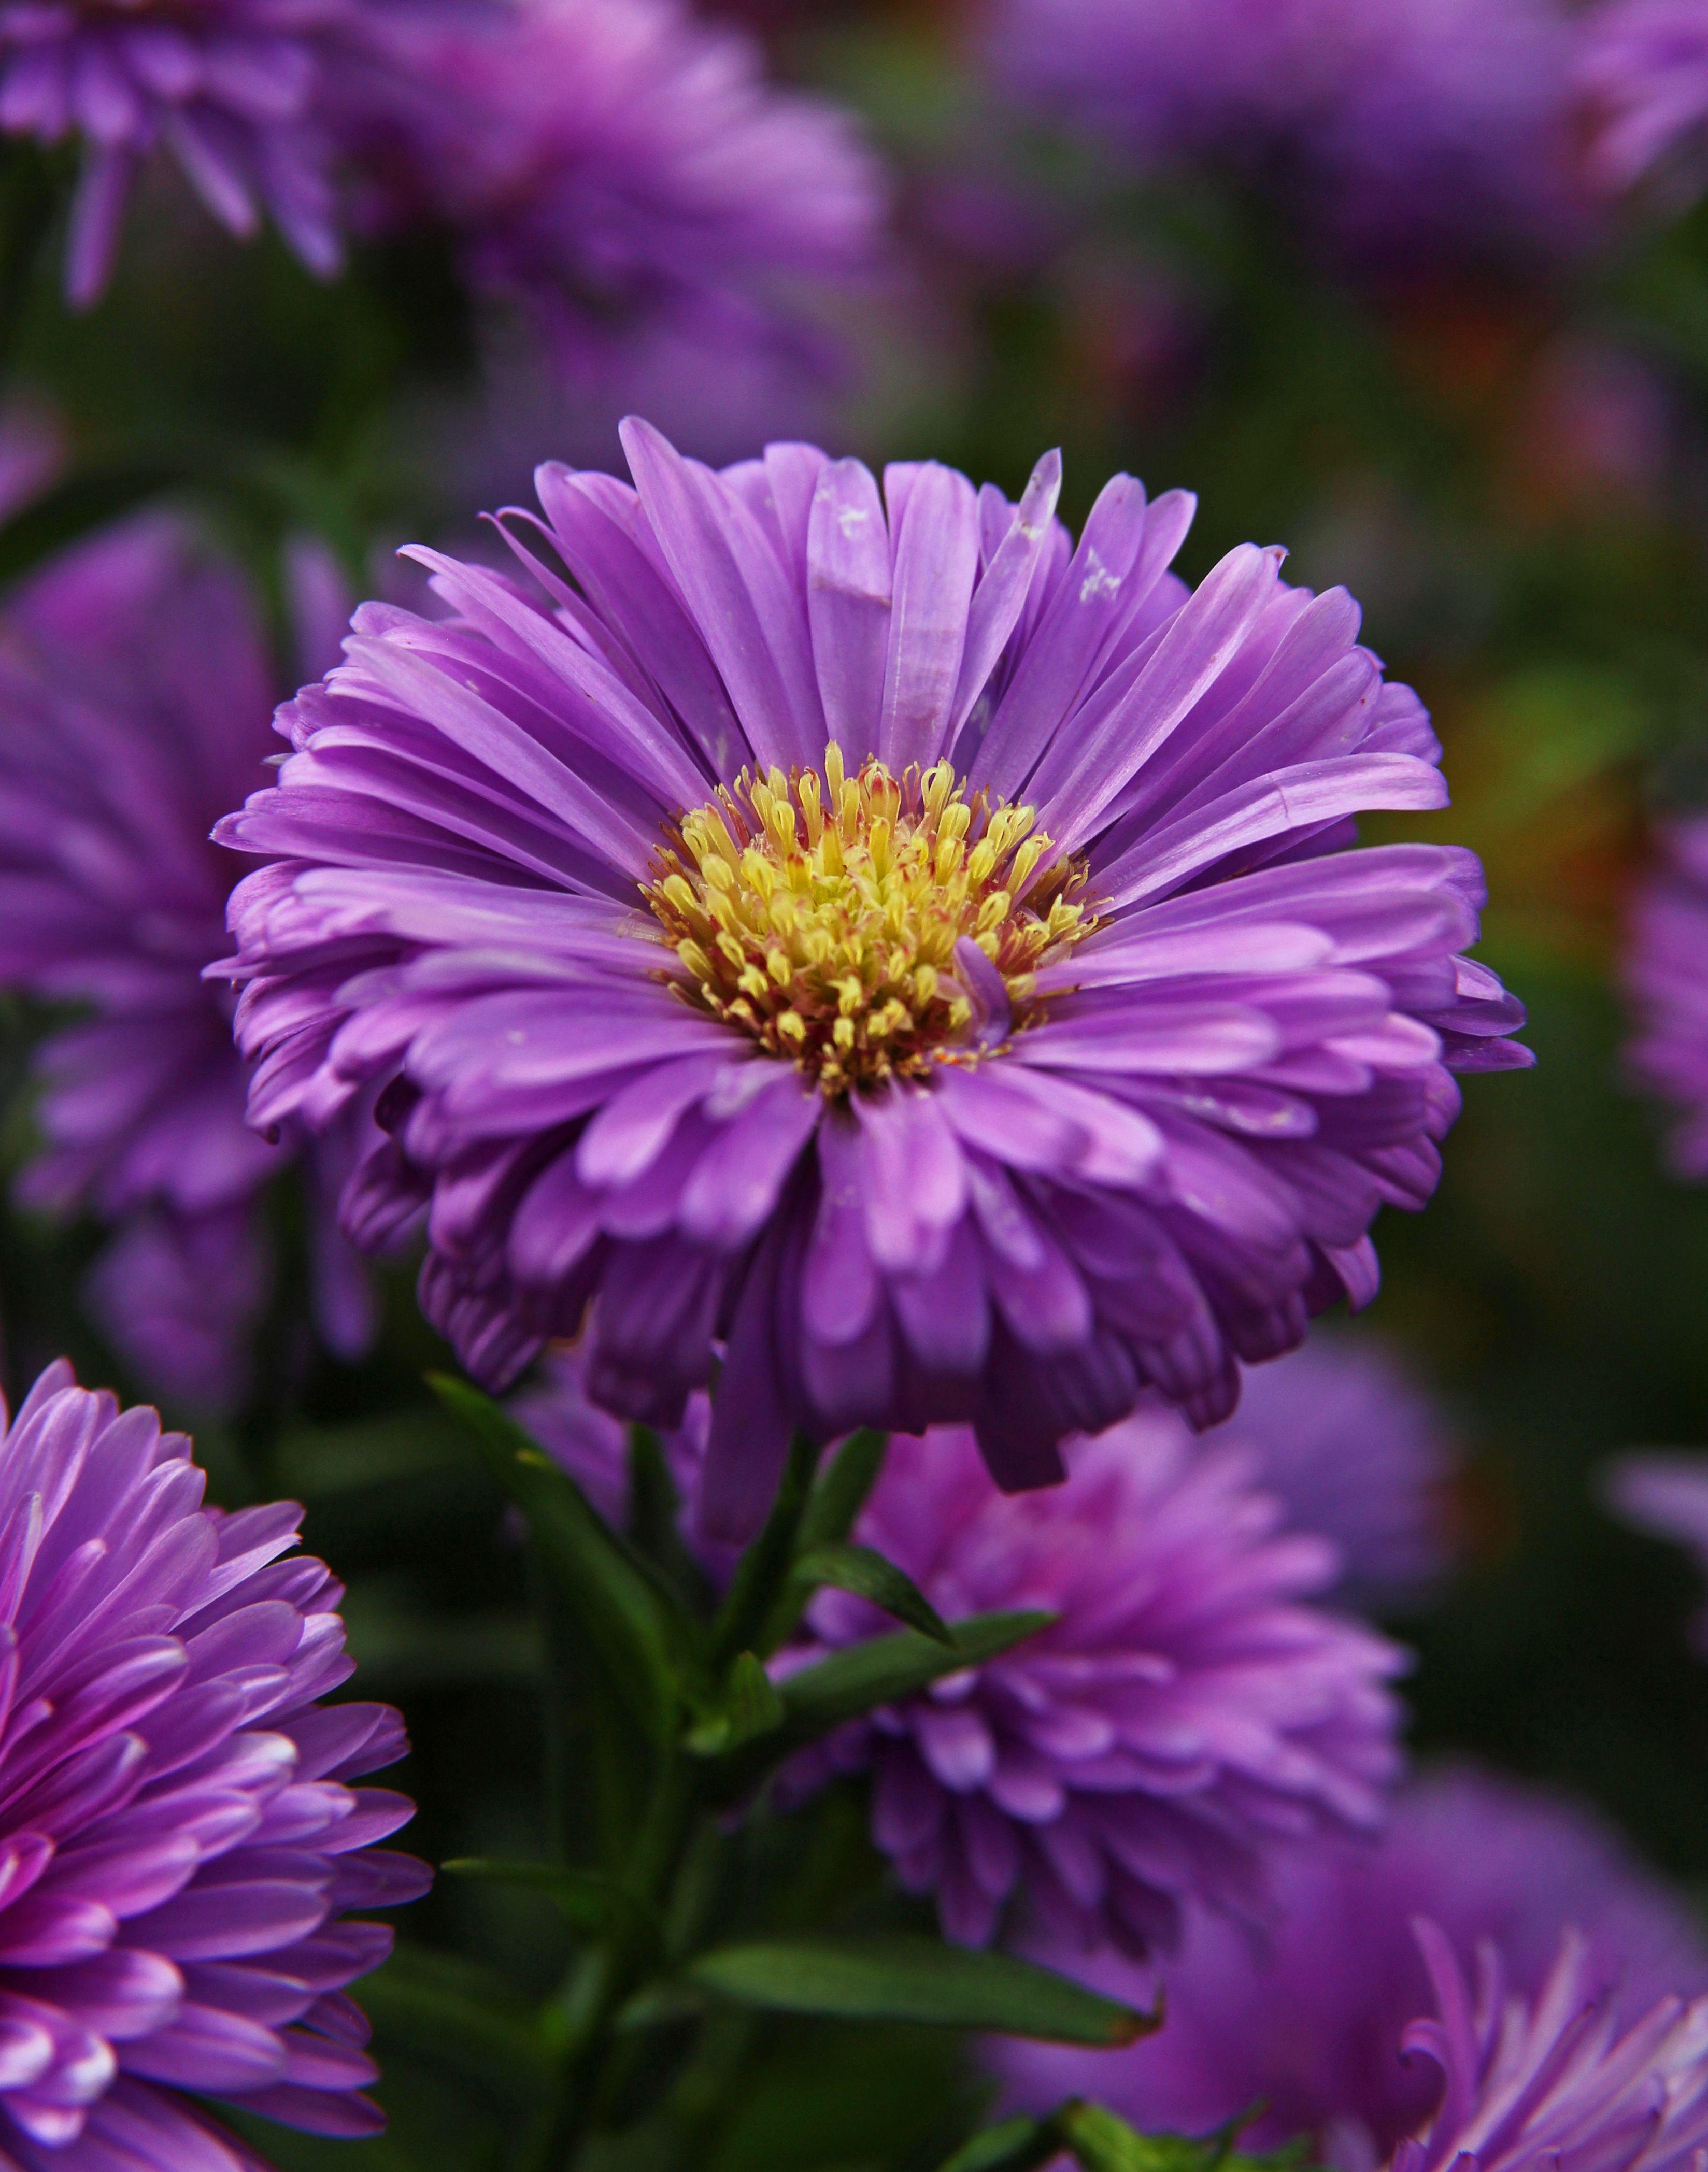 Purple Aster Flowers In 2020 Aster Flower September Birth Flower Birth Flowers